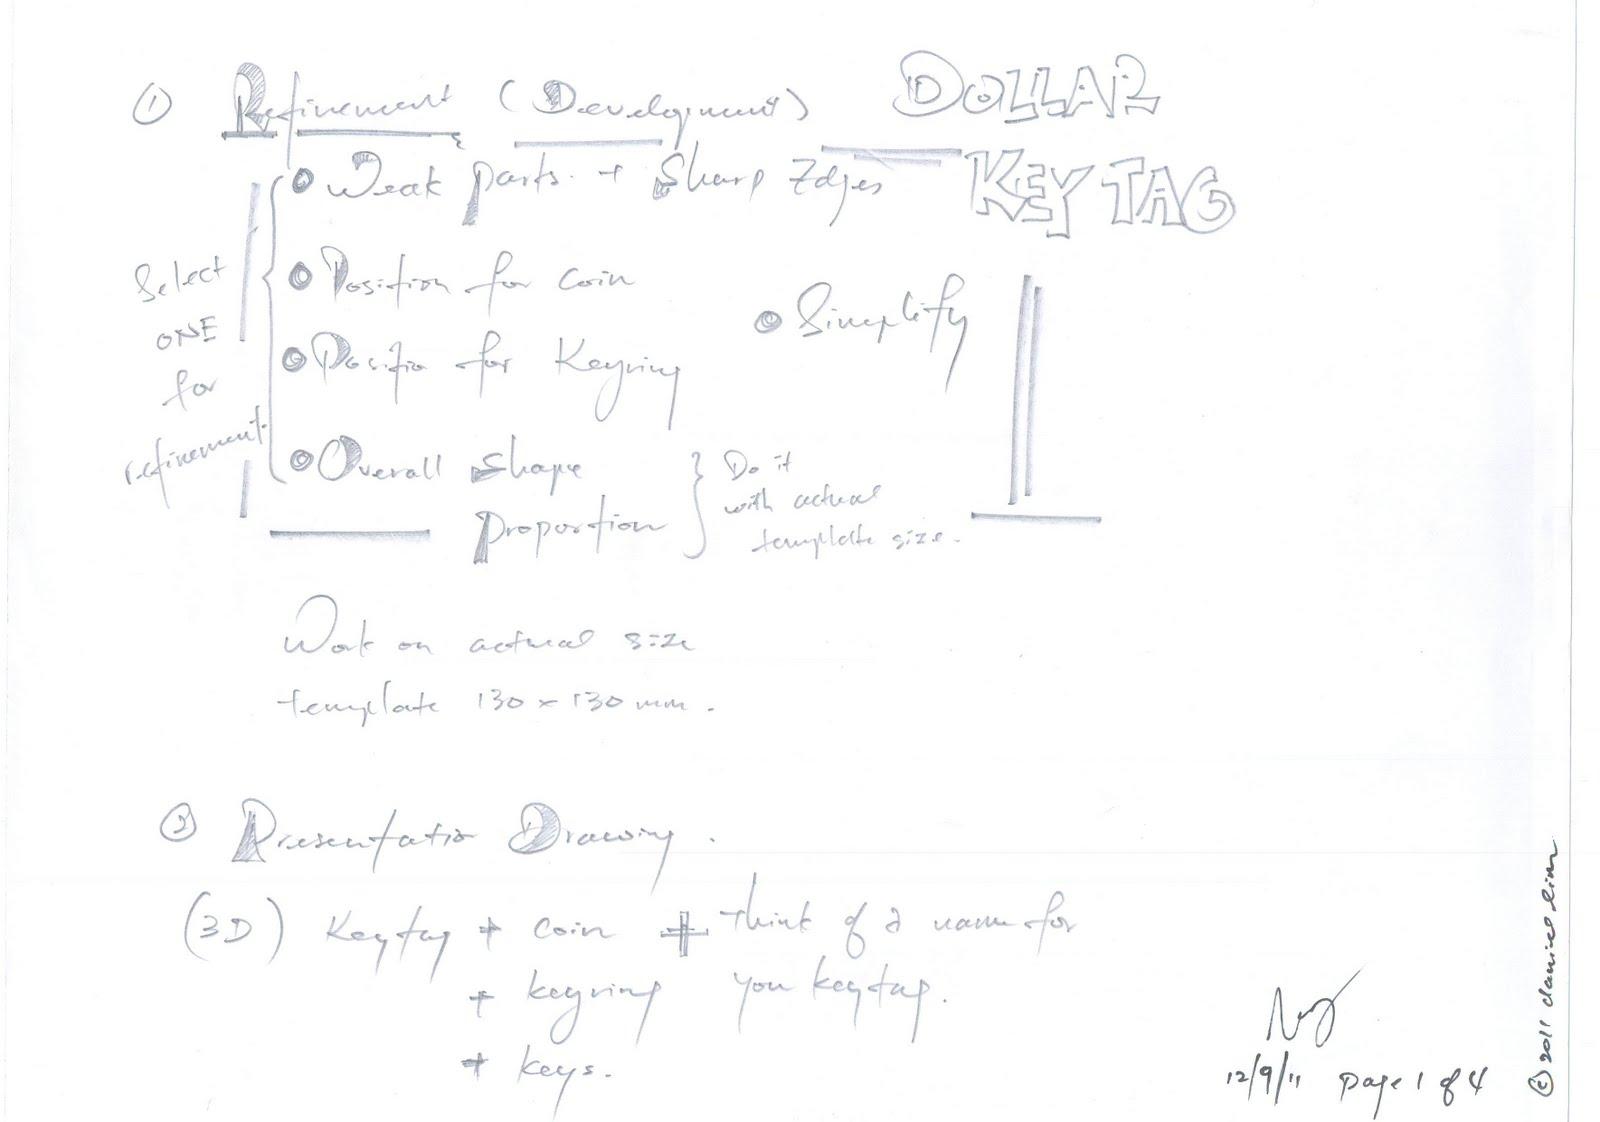 Design journal sos dollar key tag project part 3 refinement dollar key tag project part 3 refinement development ccuart Gallery